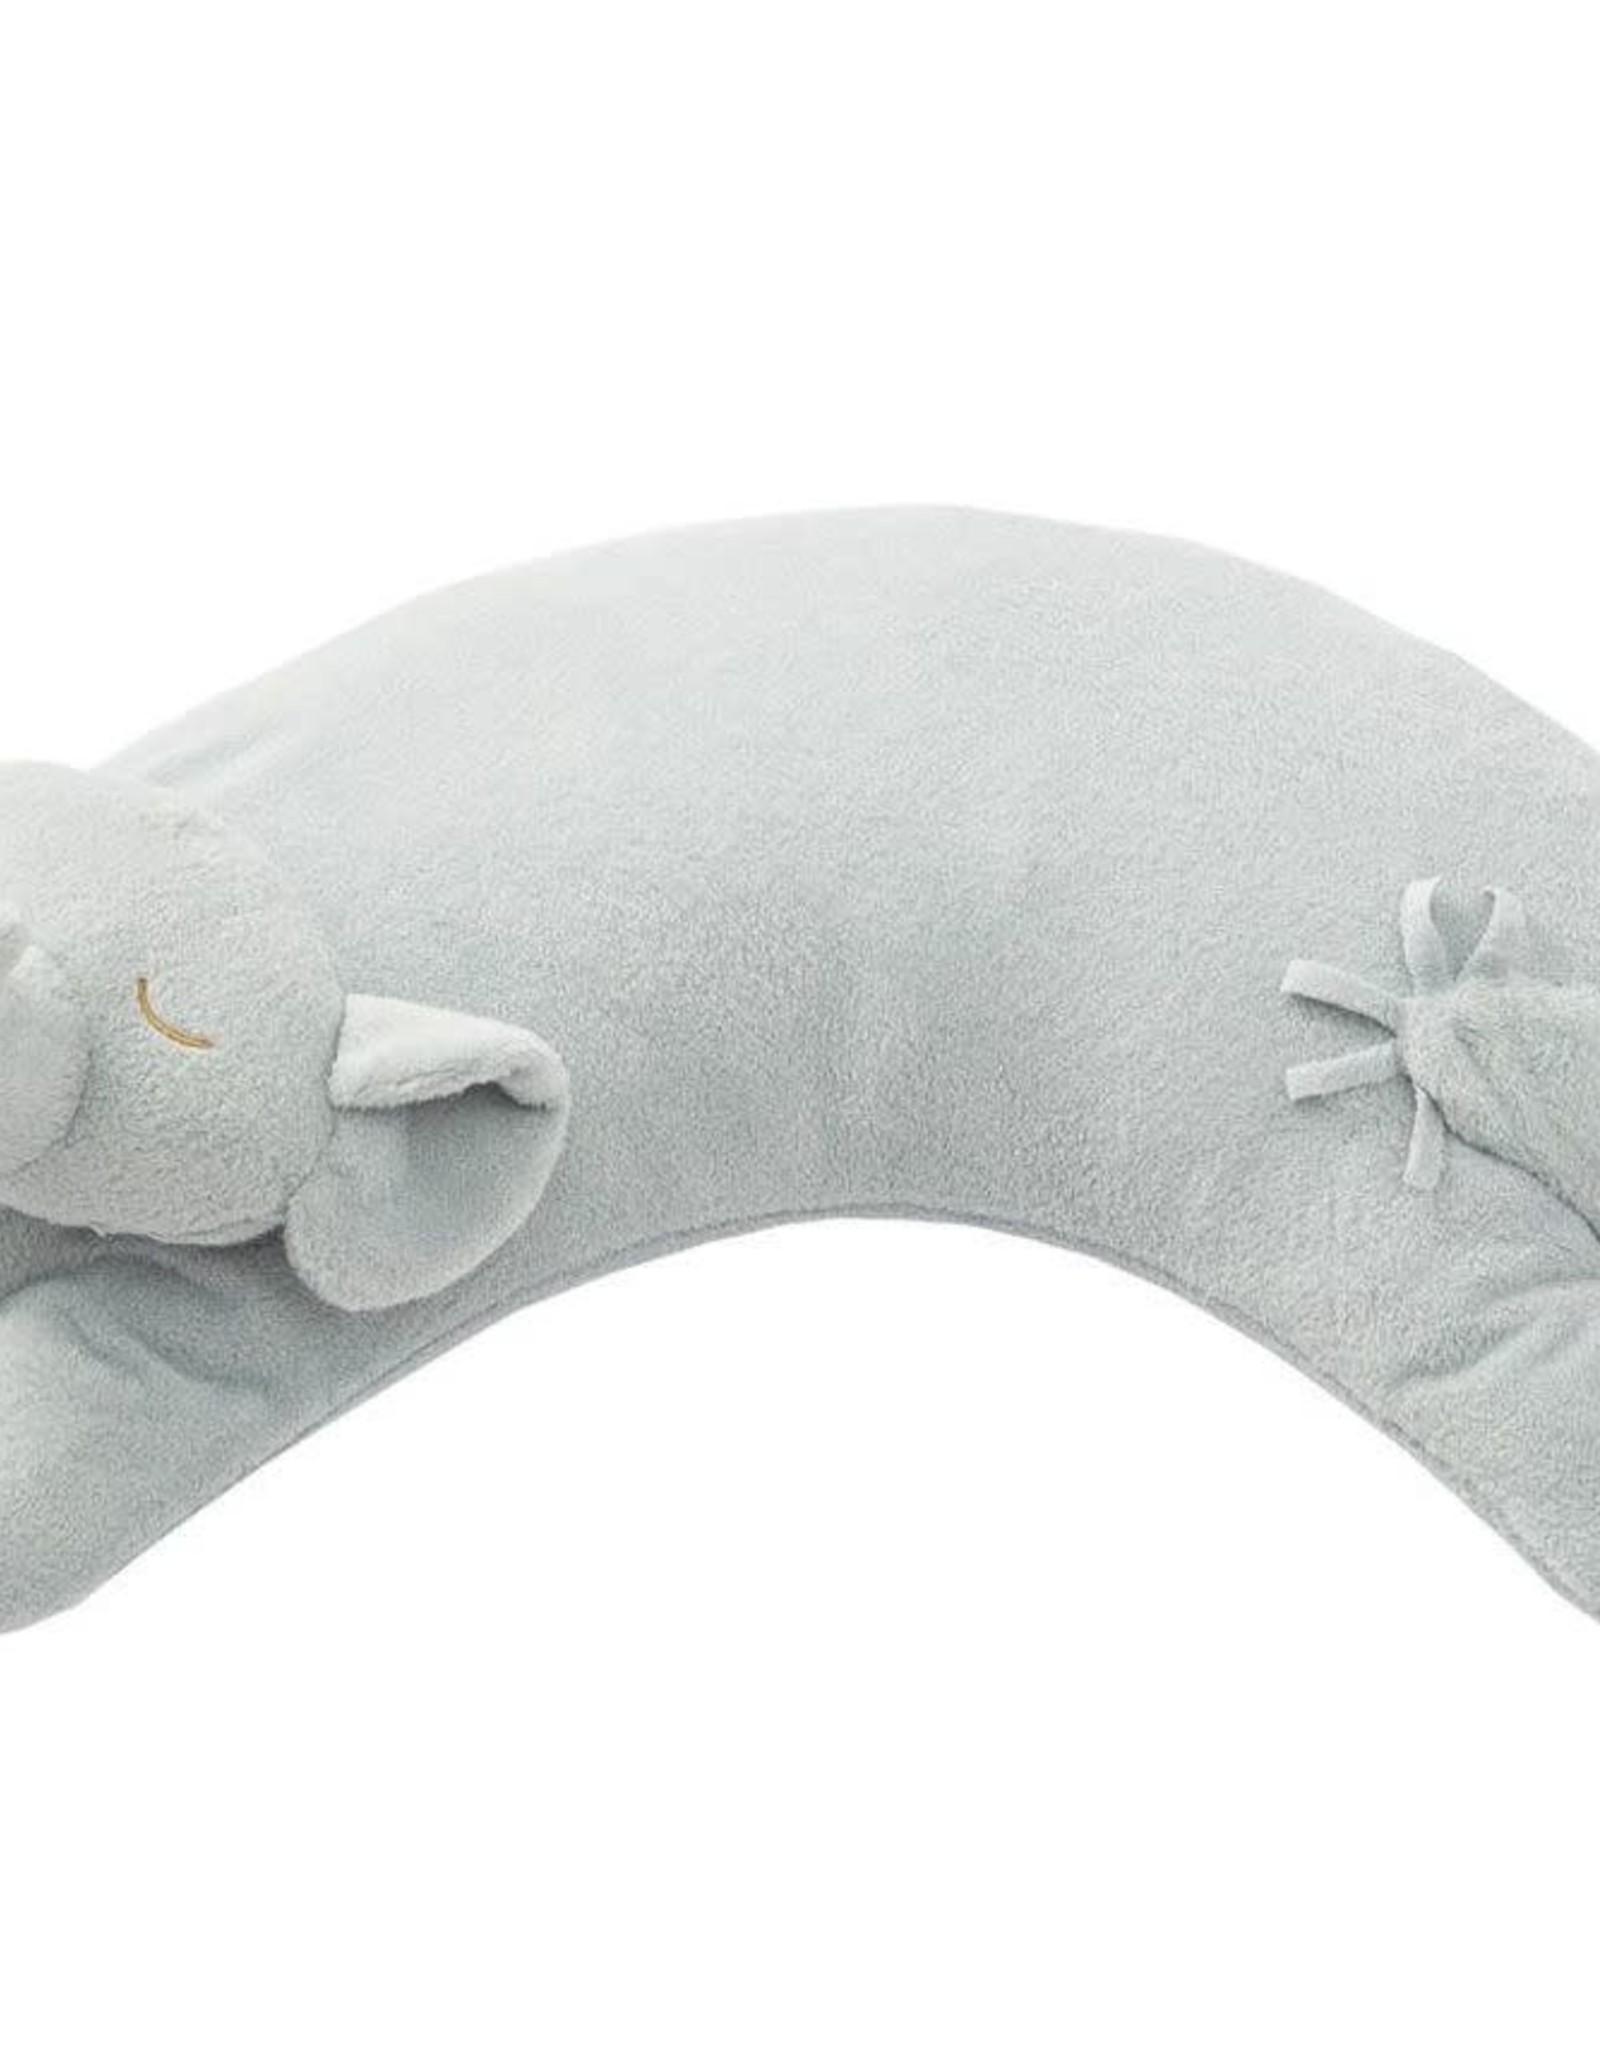 Angel Dear Curved Pillow Elephant Grey